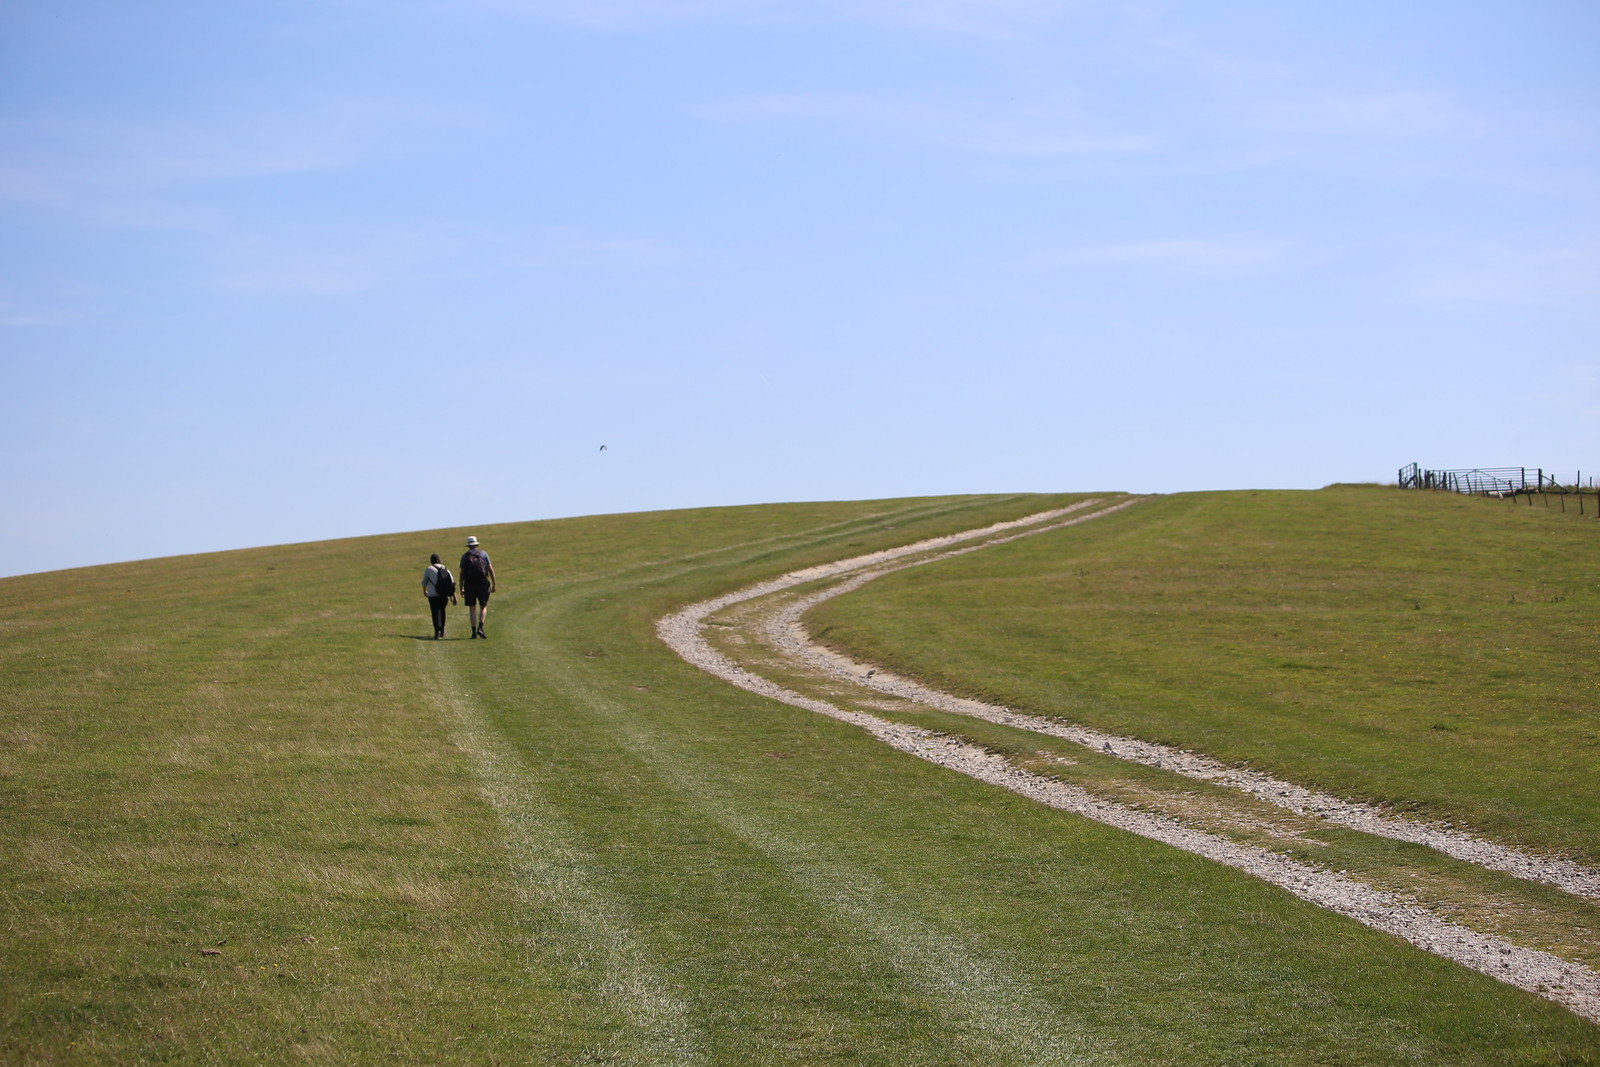 A walk on the top - near Alciston